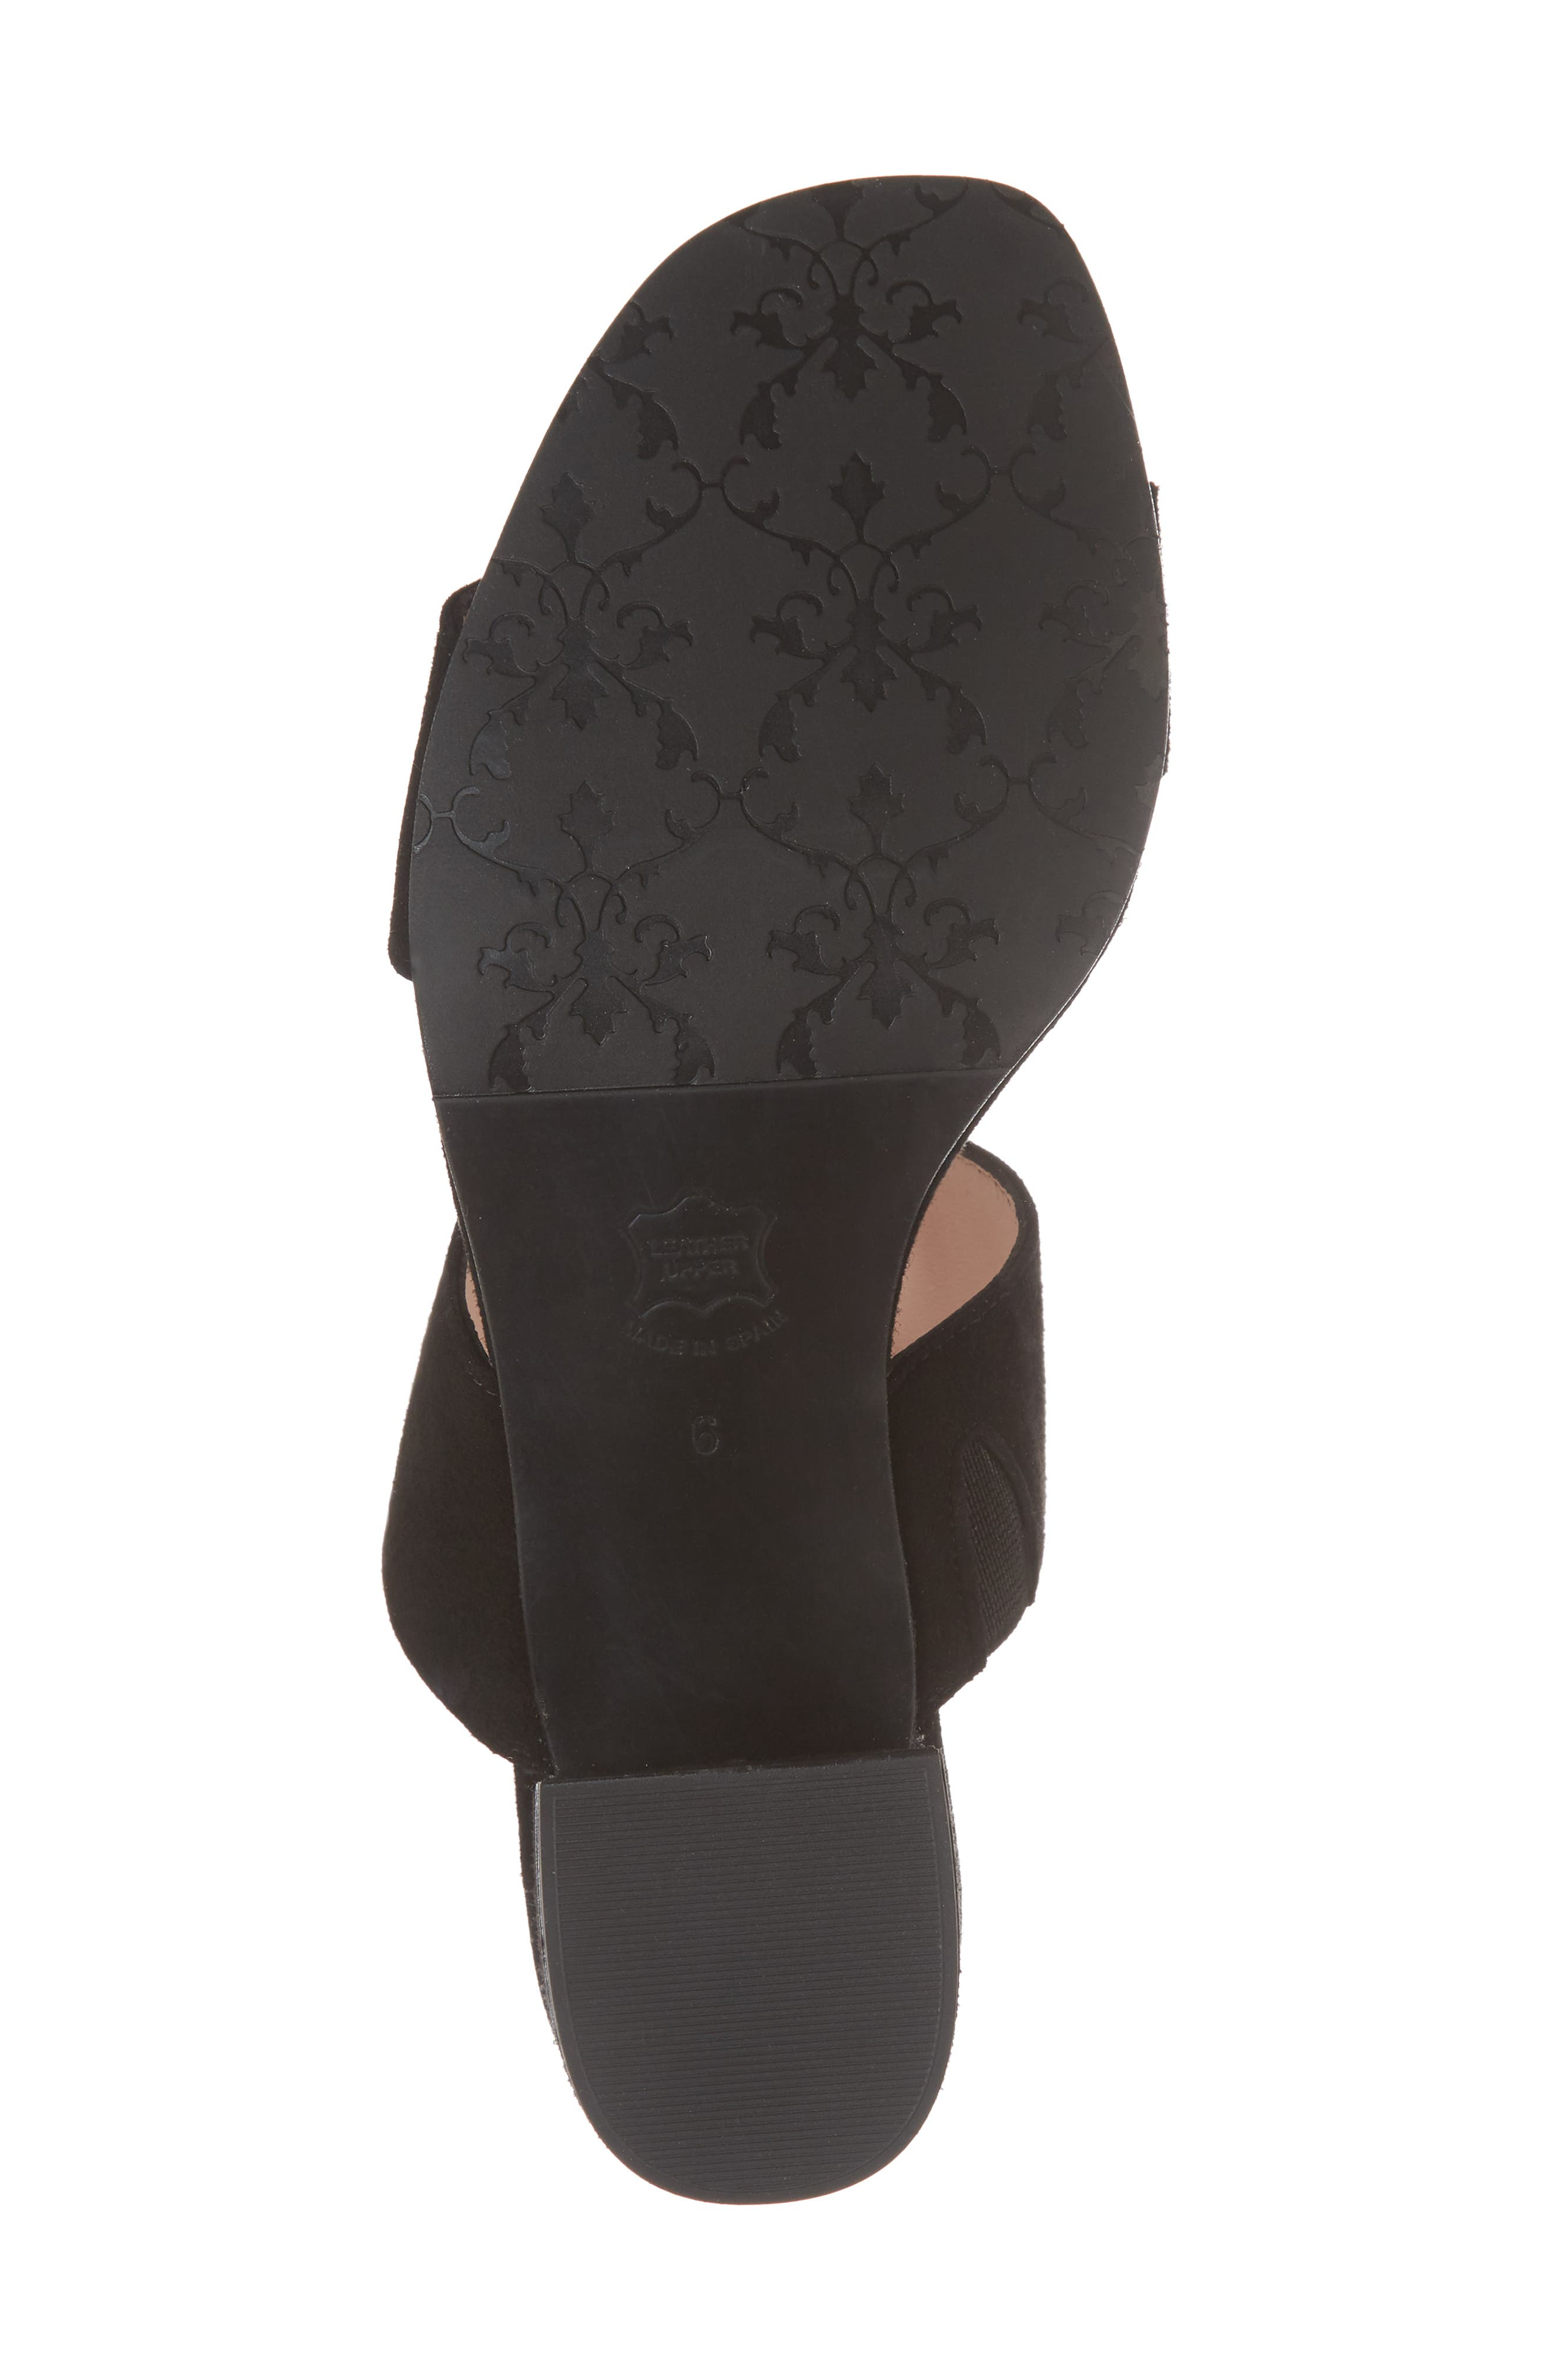 Lola Slide Sandal,                             Alternate thumbnail 6, color,                             BLACK SUEDE